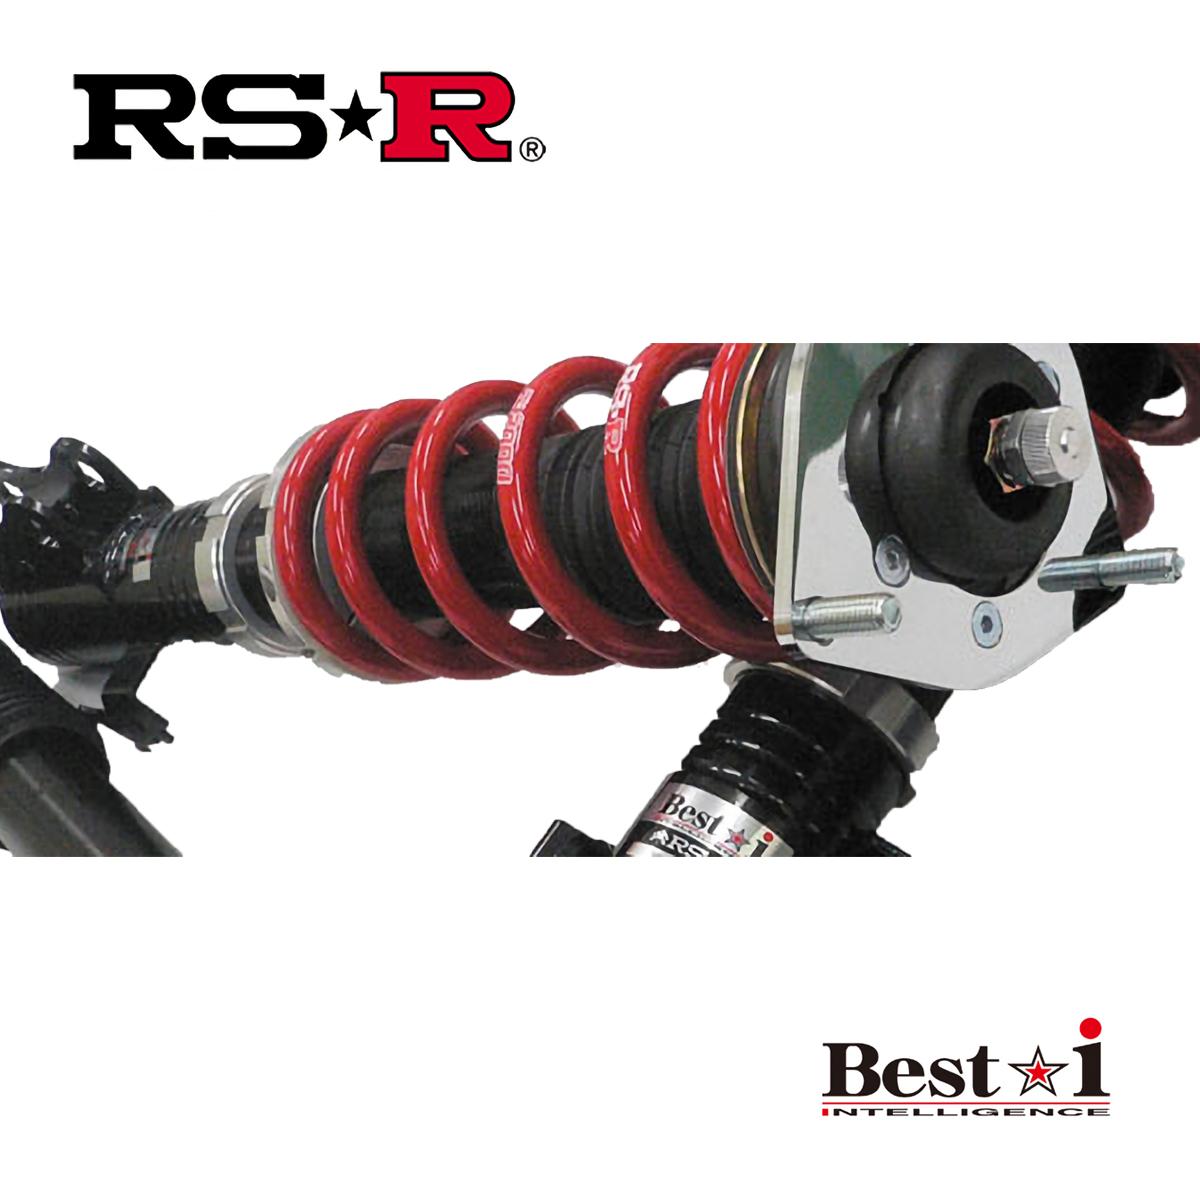 RS-R レクサス MZAH10 UX250h Fスポーツ 車高調 リア車高調整: 全長式 BIT308M ベストi上下 RSR 個人宅発送追金有